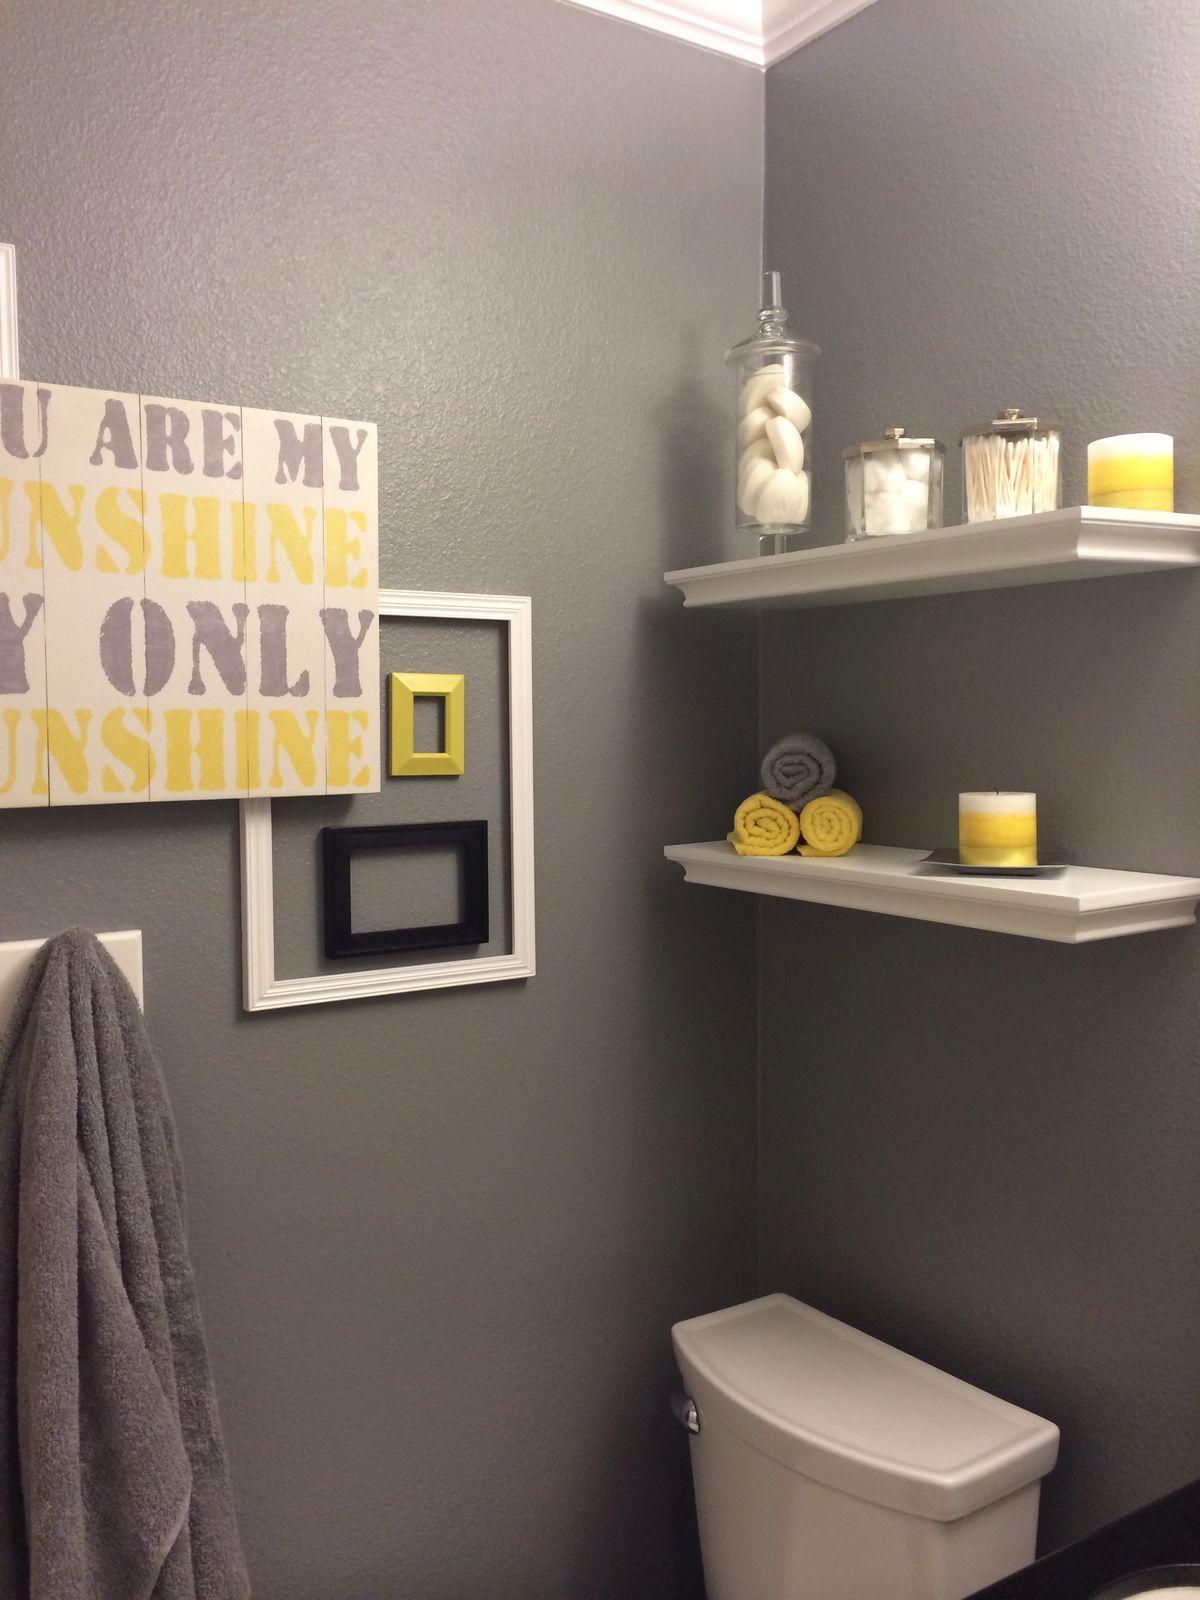 Pin By Maddie On Yellow Gray Bathroom Yellow Bathroom Decor